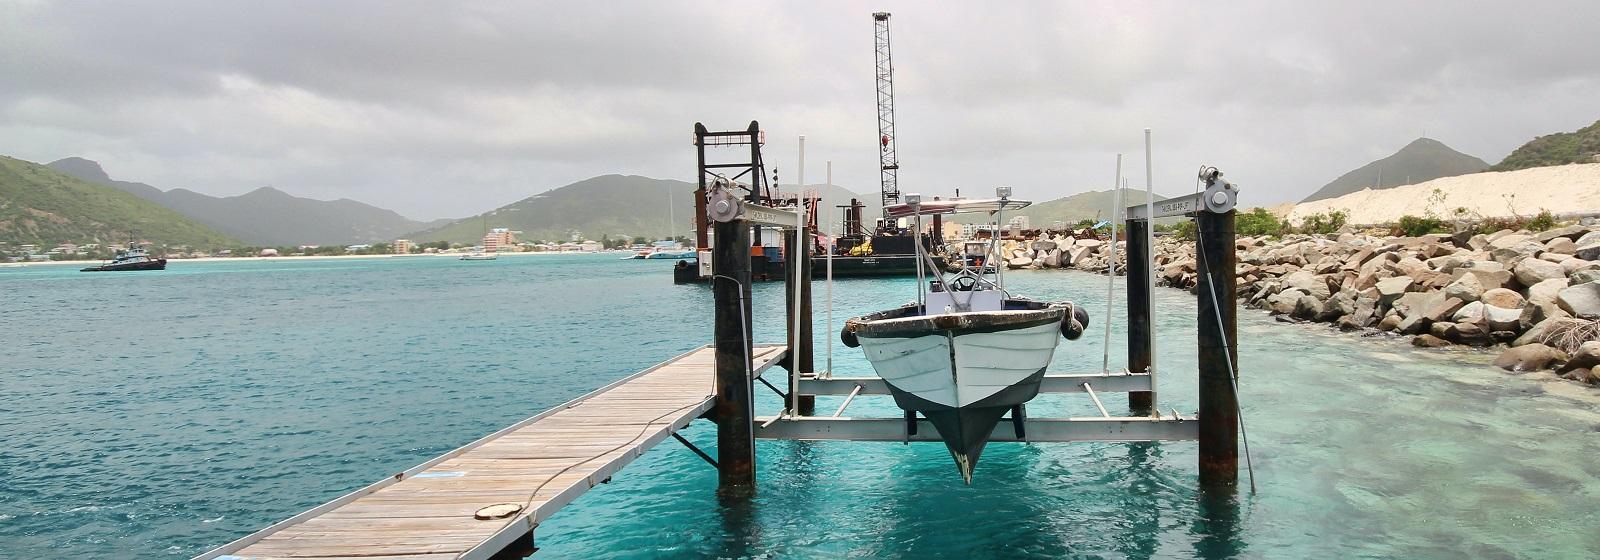 Things to do in St Maarten